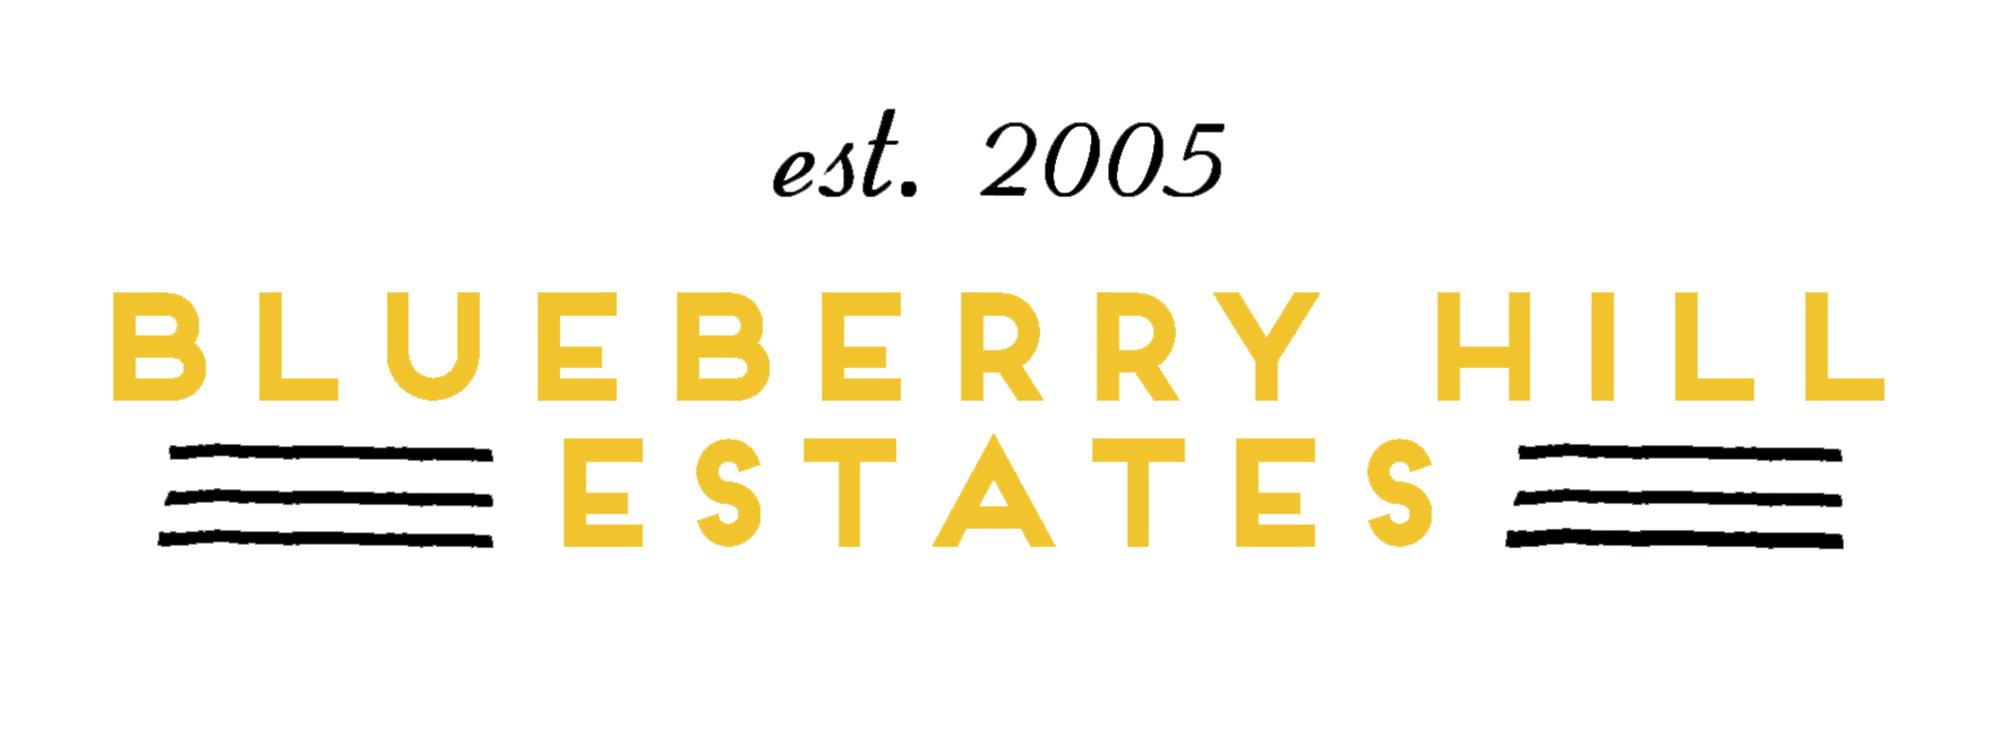 Blueberry Hill Estates